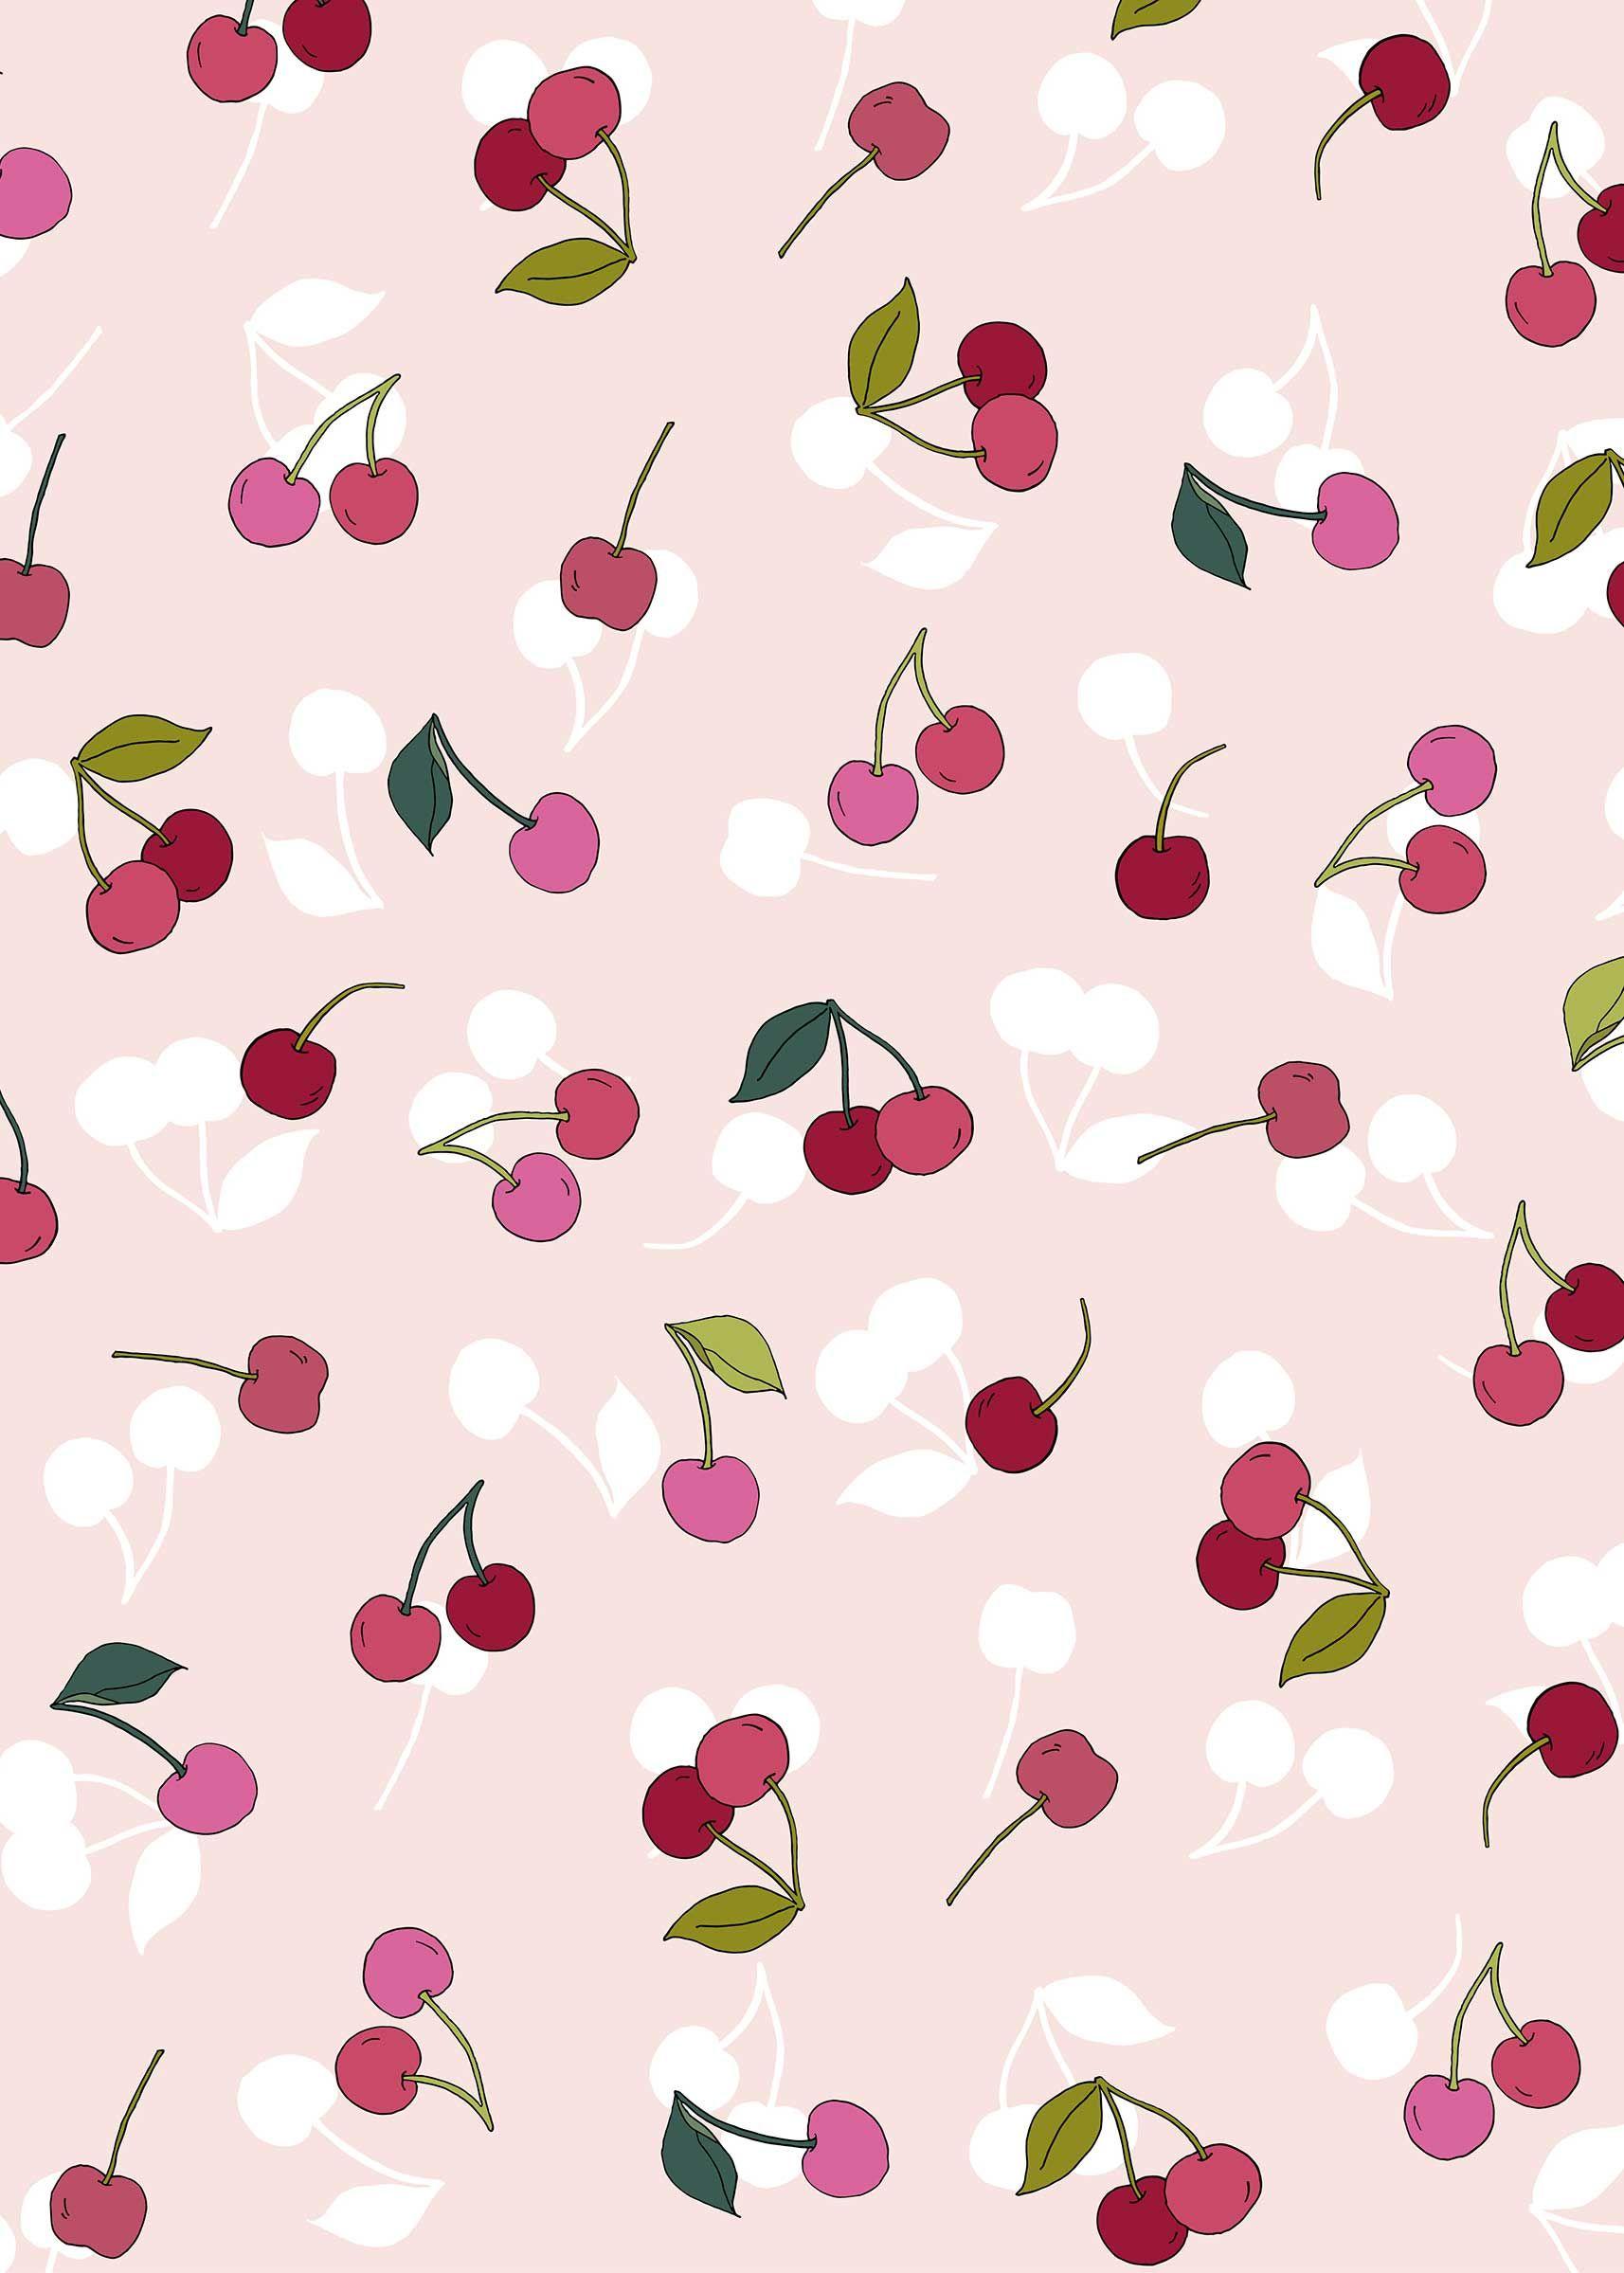 Cherry Desktop And Ipad Wallpaper Cute Wallpapers For Ipad Ipad Pro Wallpaper Ipad Wallpaper